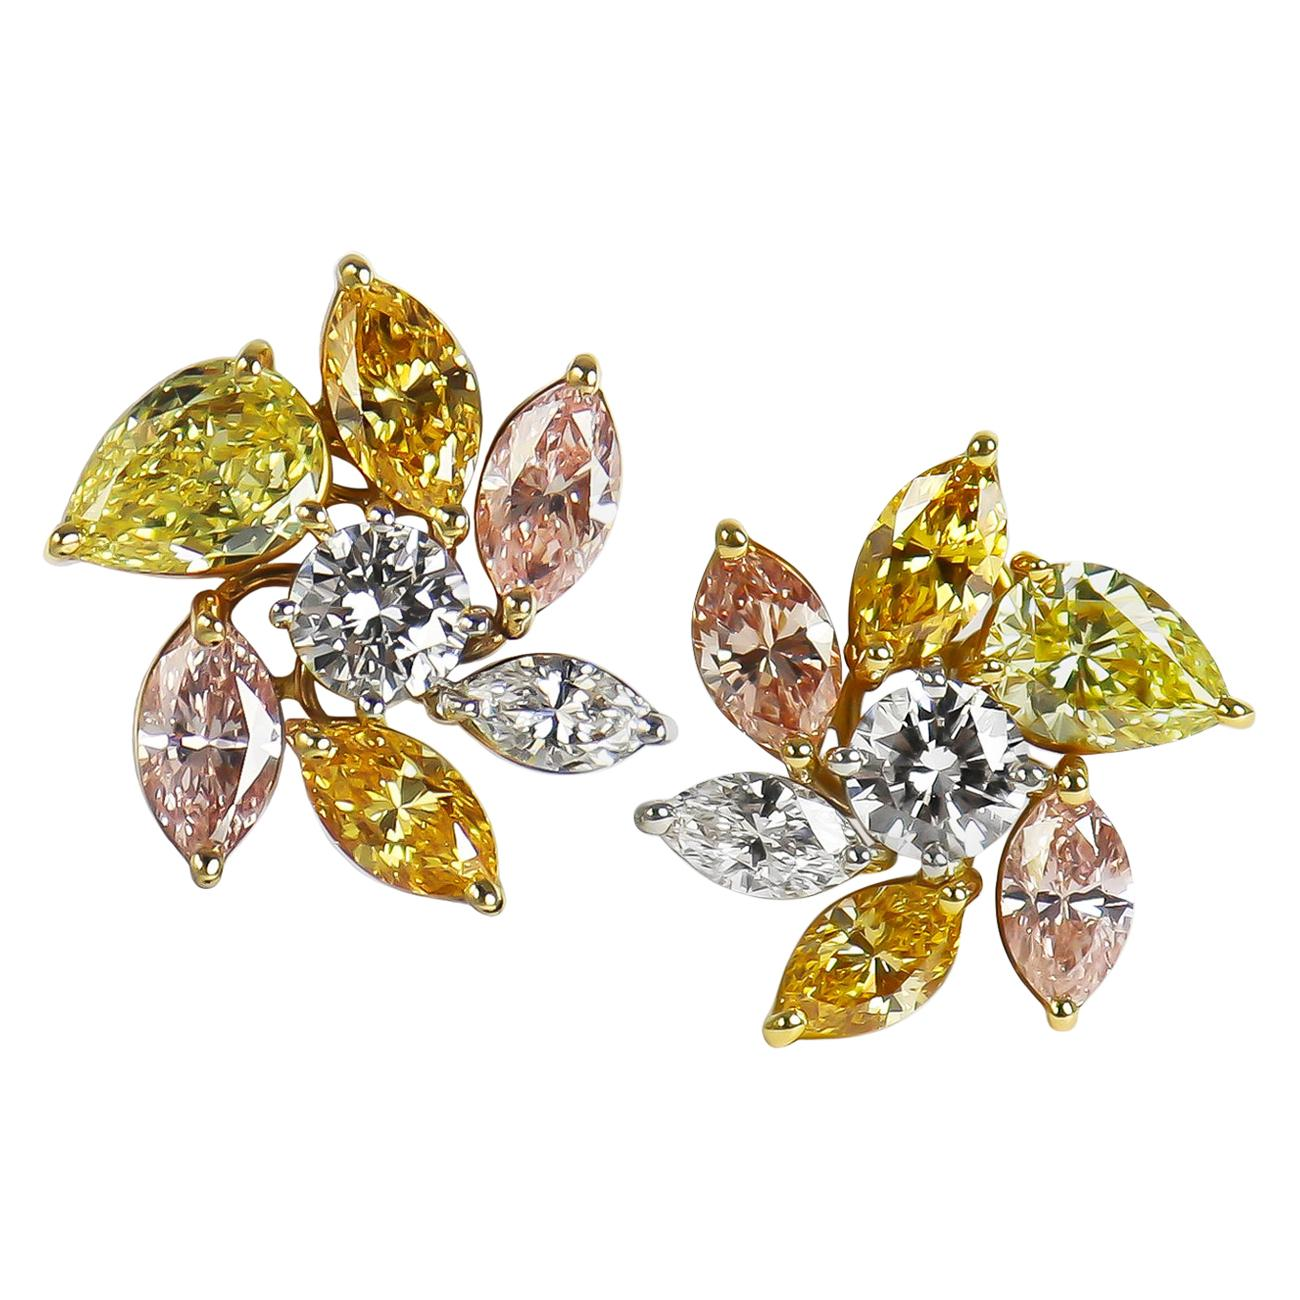 J. Birnbach's 5.39 CTW Natural, Assorted, Fancy Color Diamond Cluster Earrings